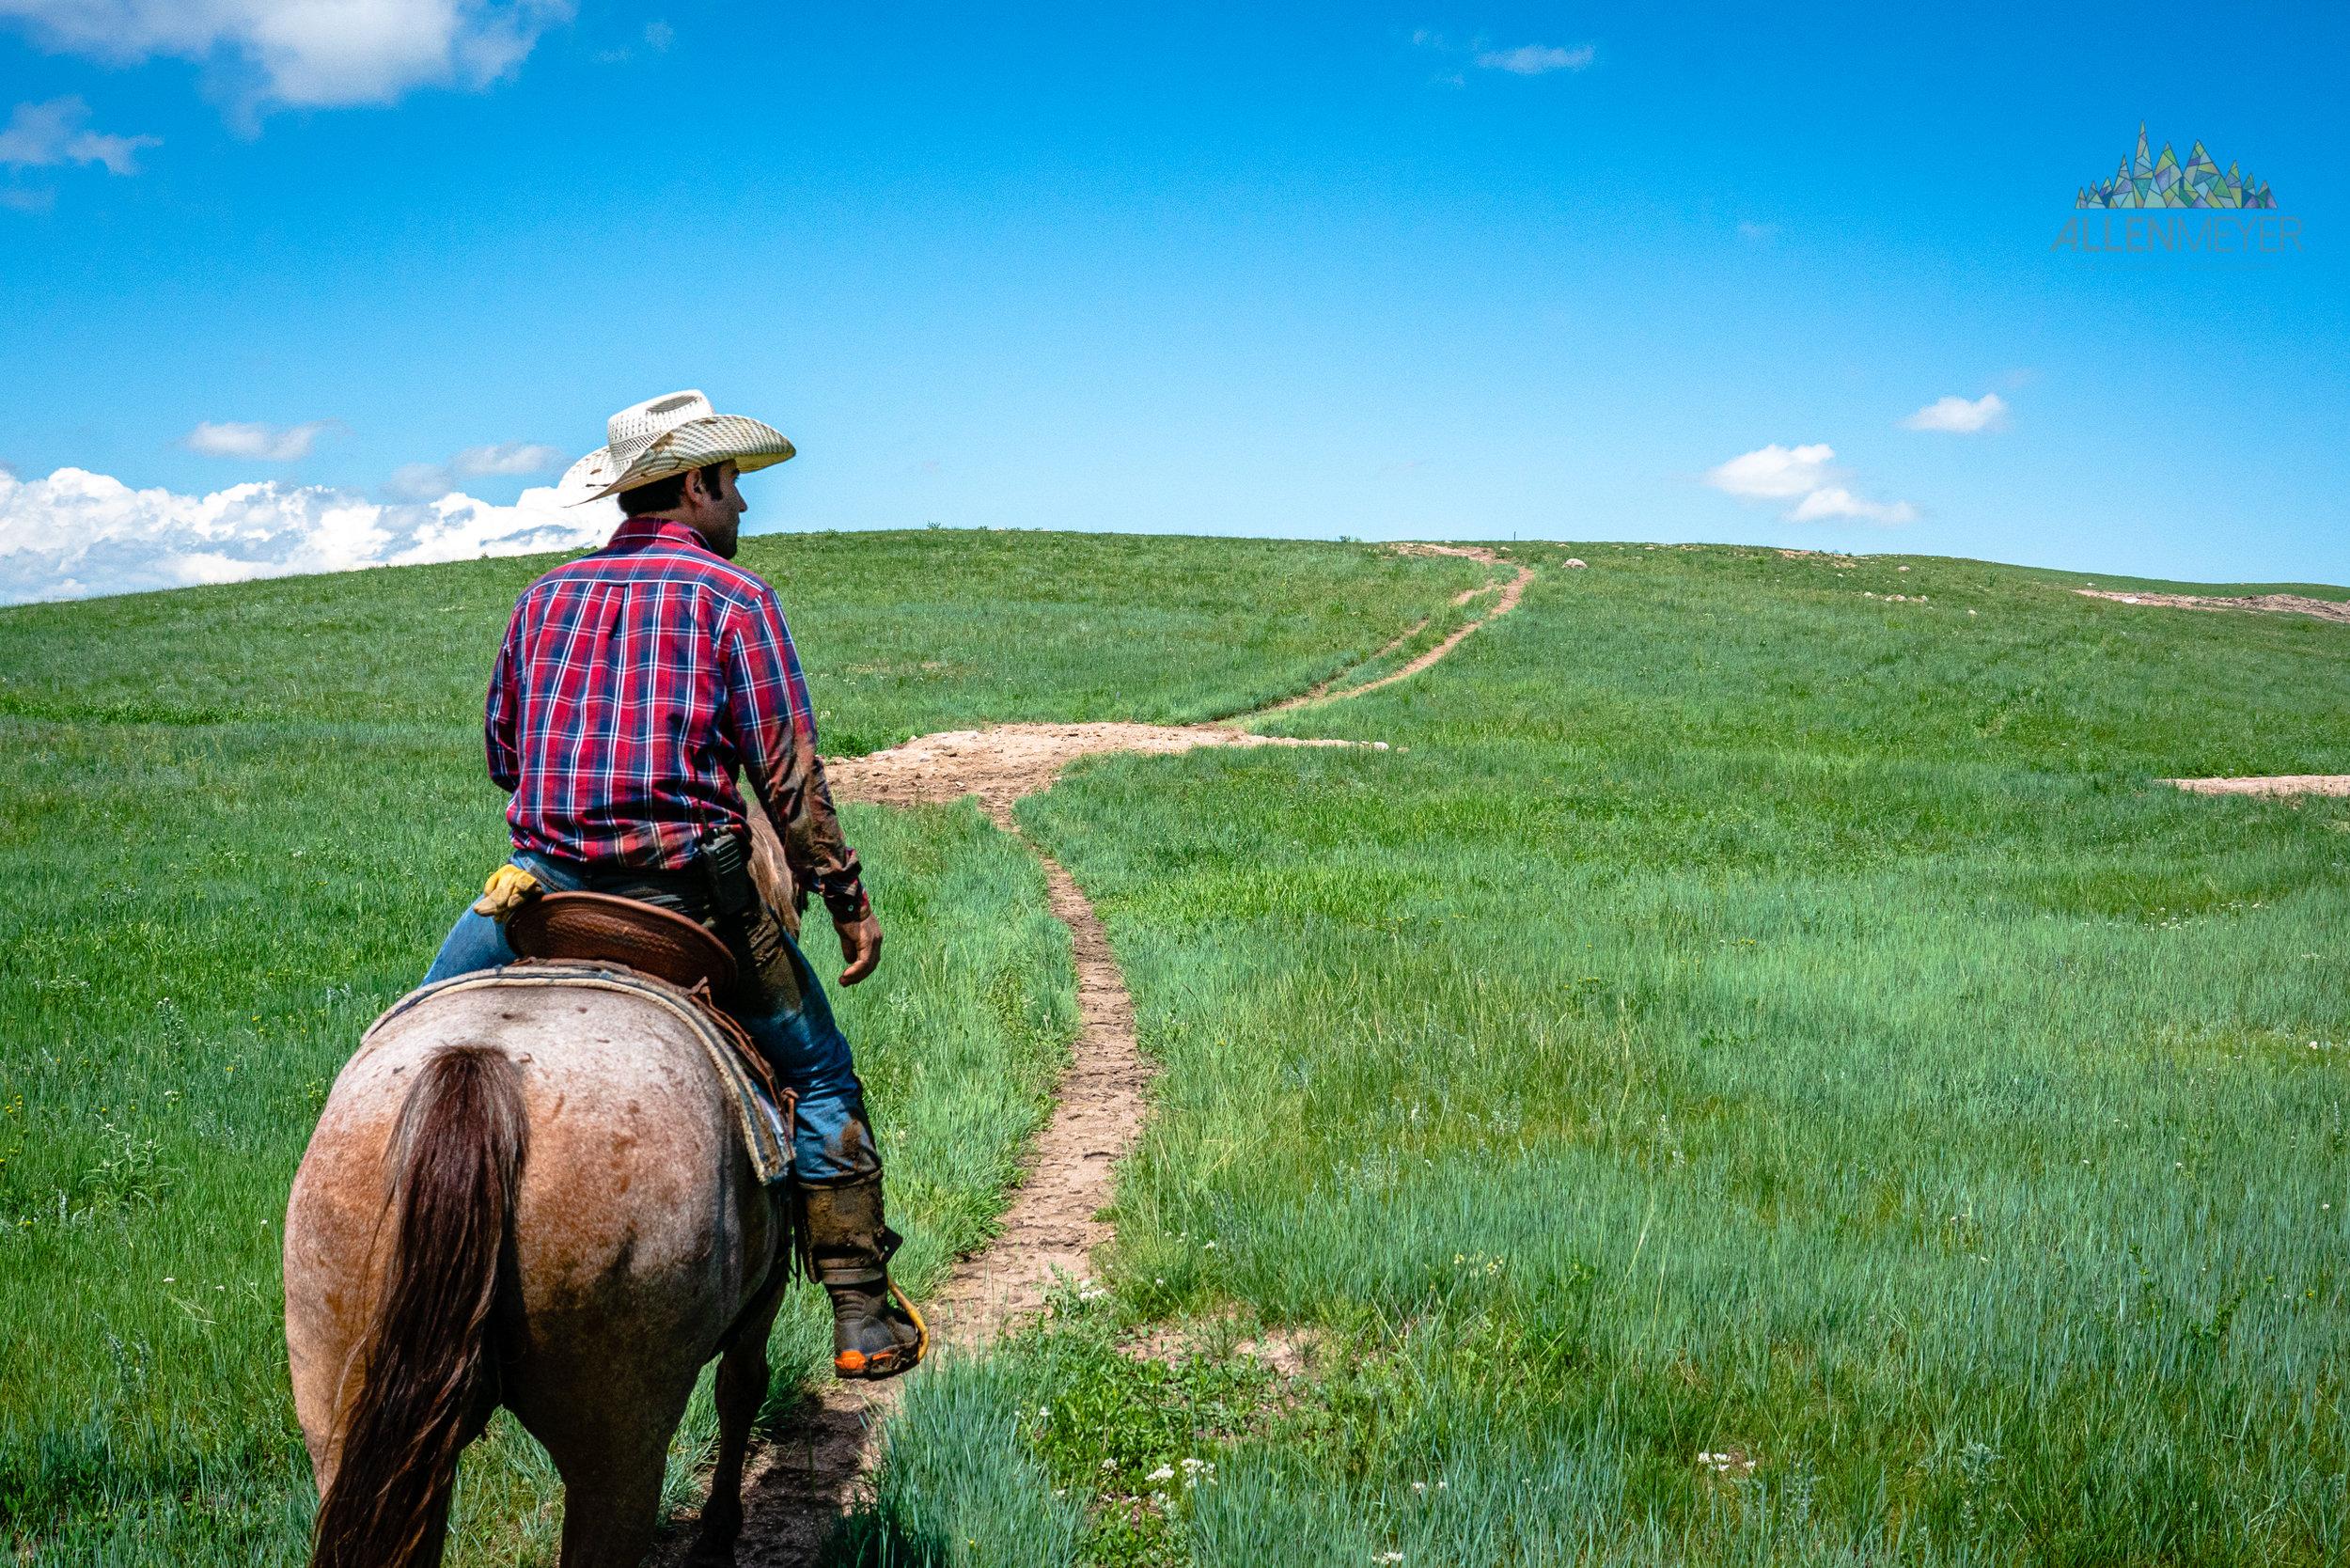 Outdoor Adventures In Cheyenne, Wyoming; Photography by Allen Meyer-04178.jpg